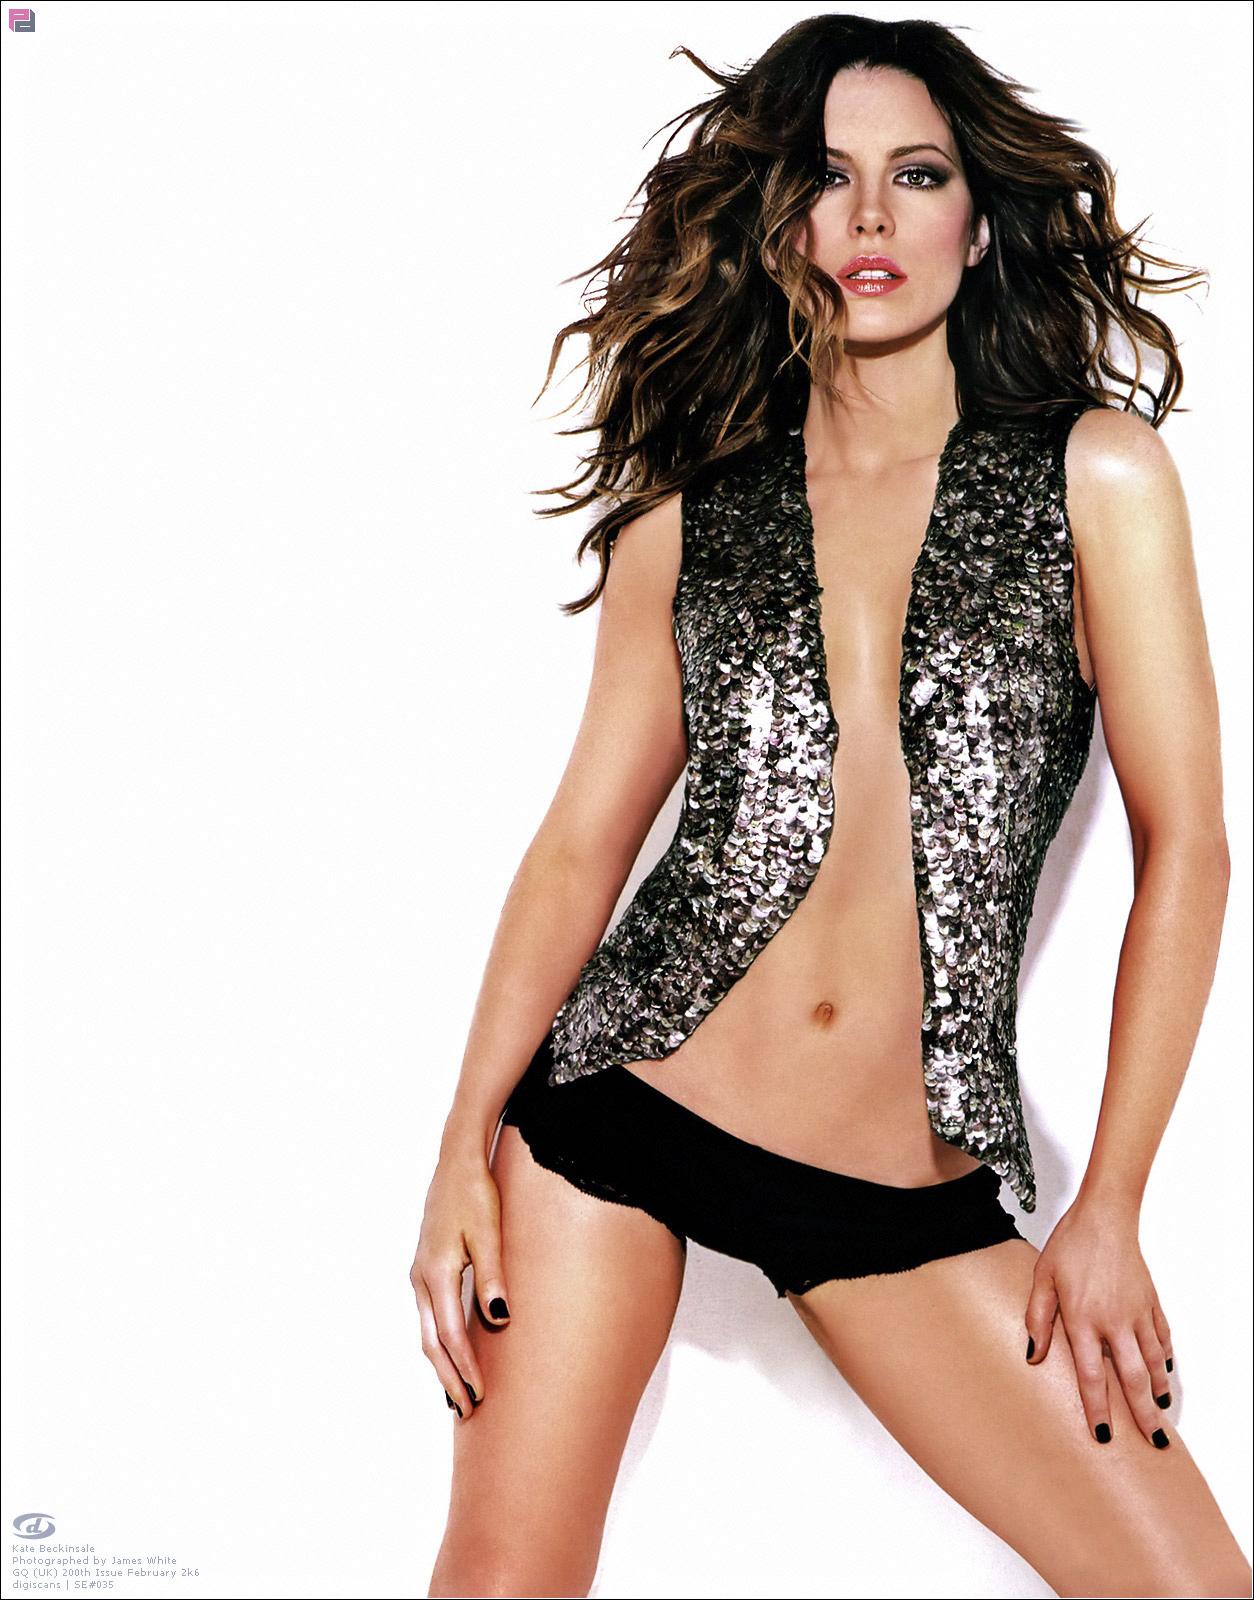 http://4.bp.blogspot.com/-q6r8hTF03Ek/Txb-6KVbk-I/AAAAAAAAAk0/unUGZbjLtT8/s1600/Kate-Beckinsale-Black-Panties-hot-2012-03.jpg